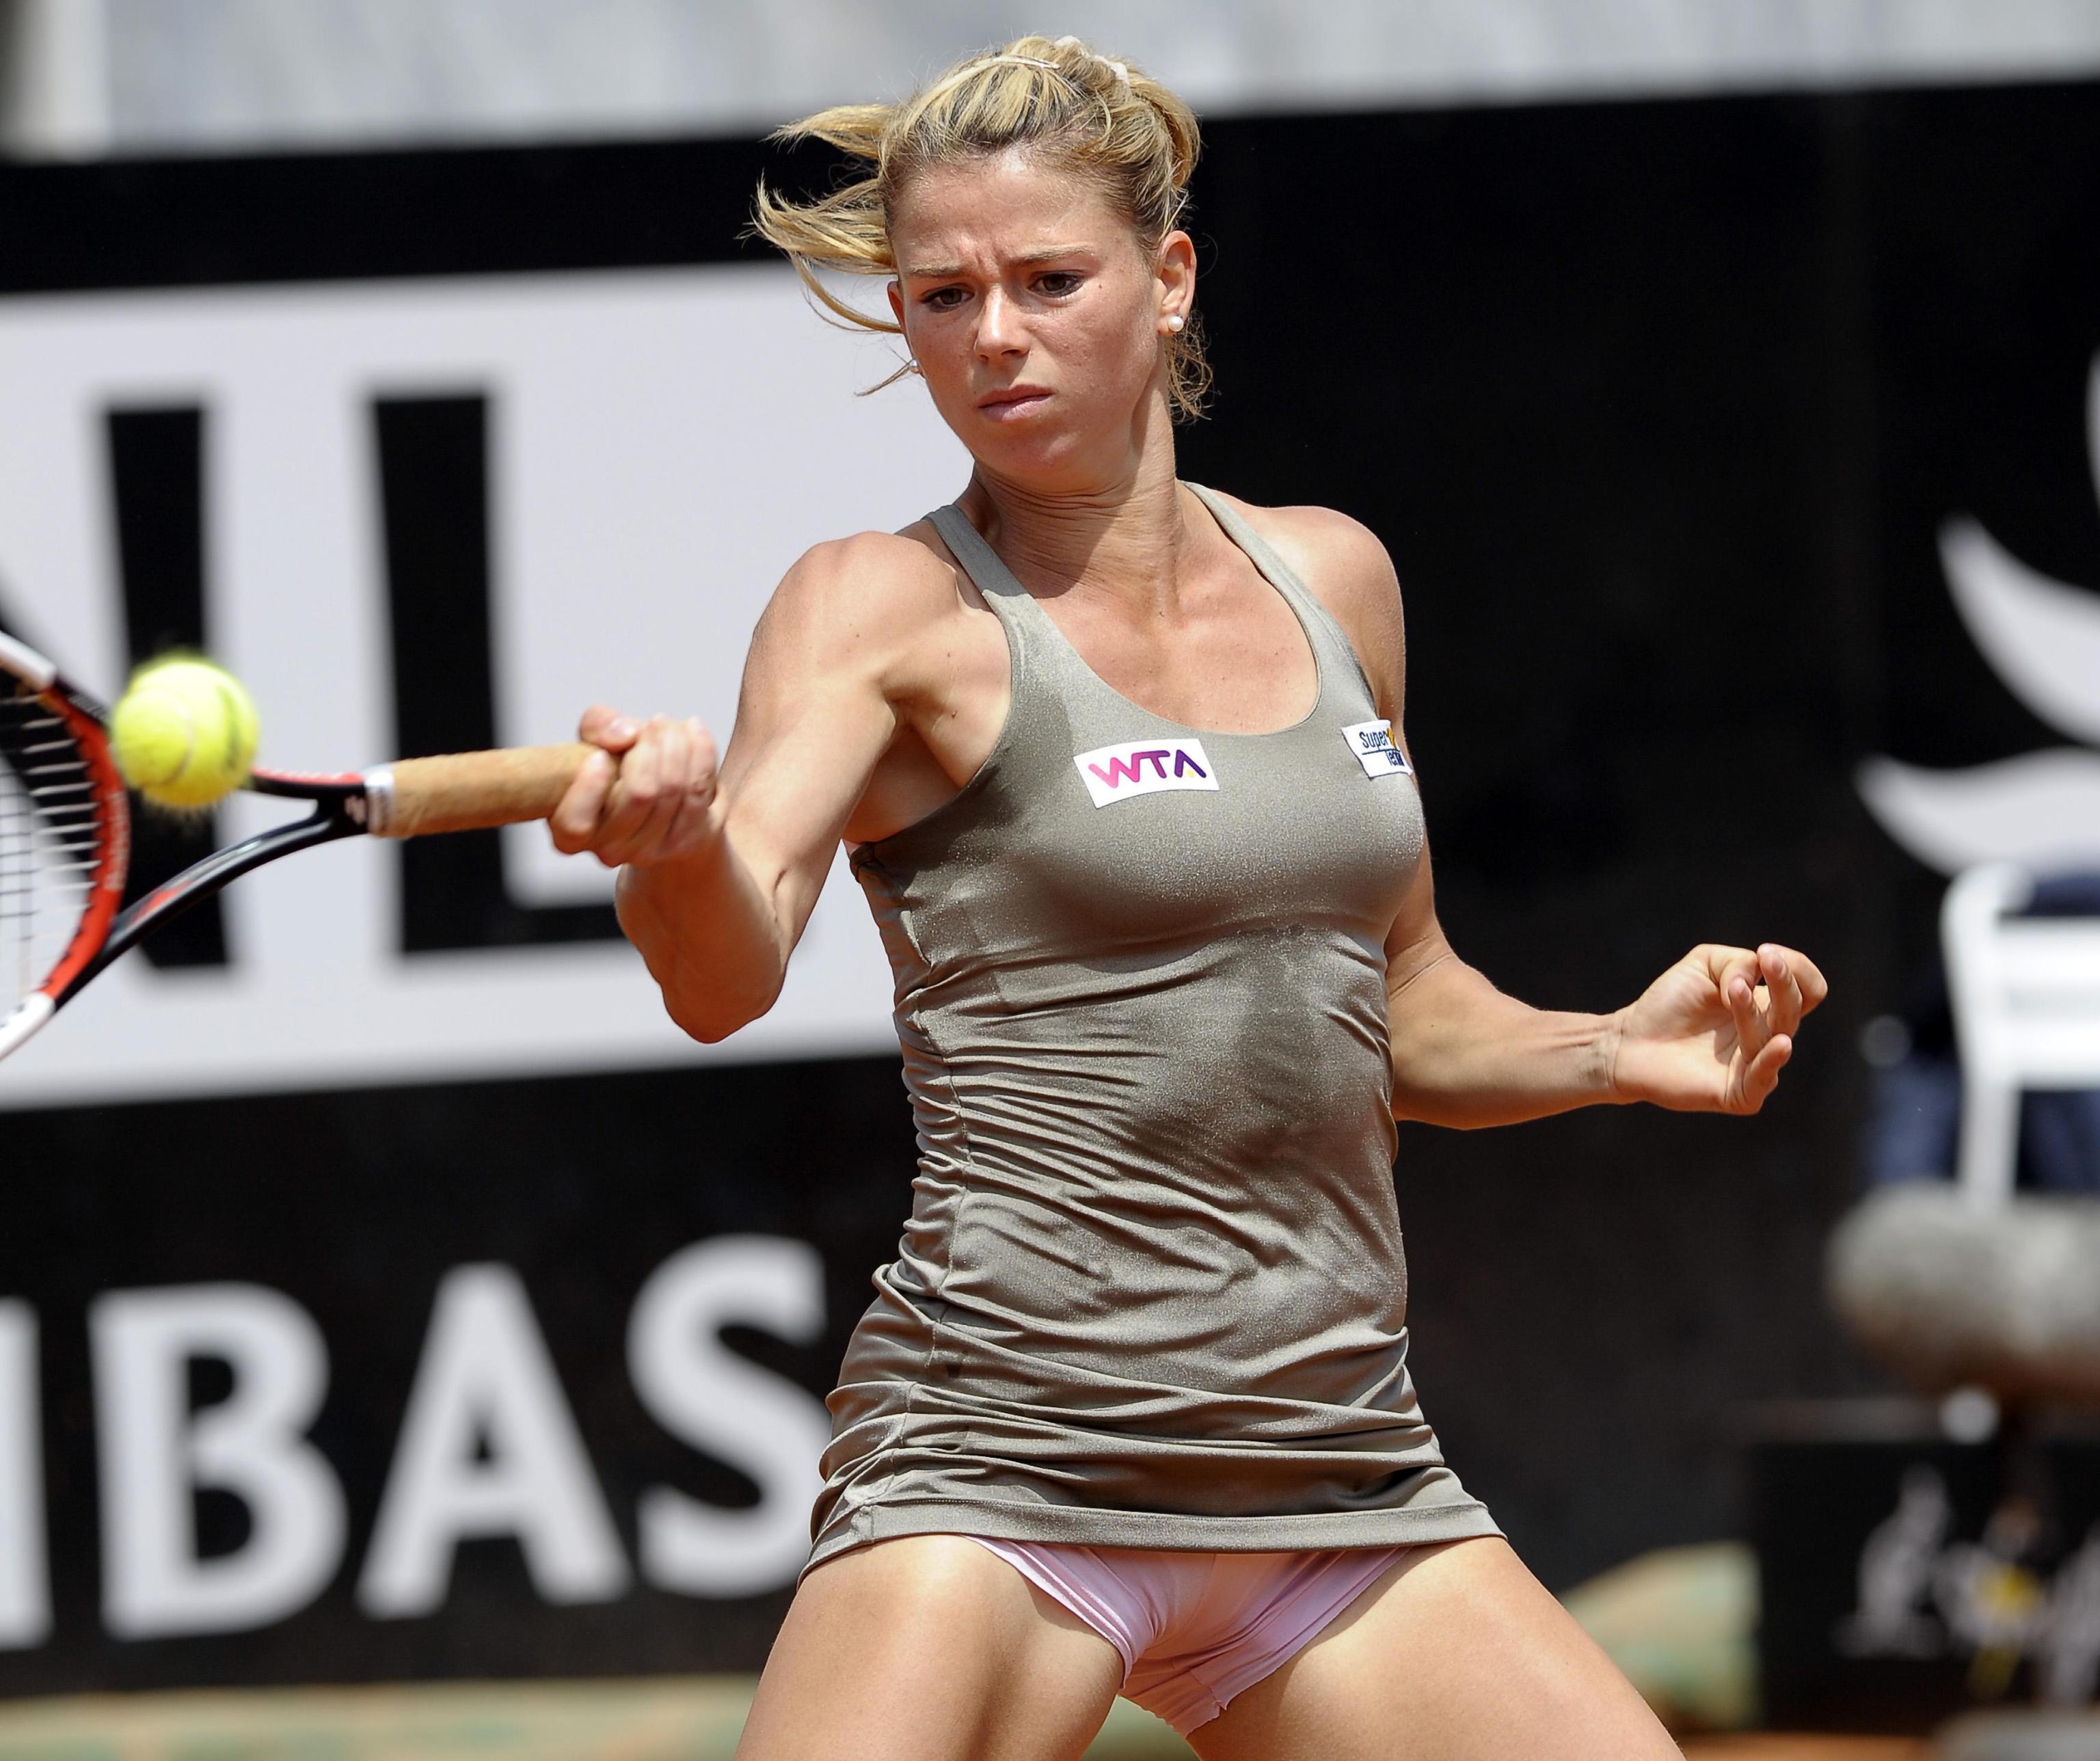 tenis women s porno